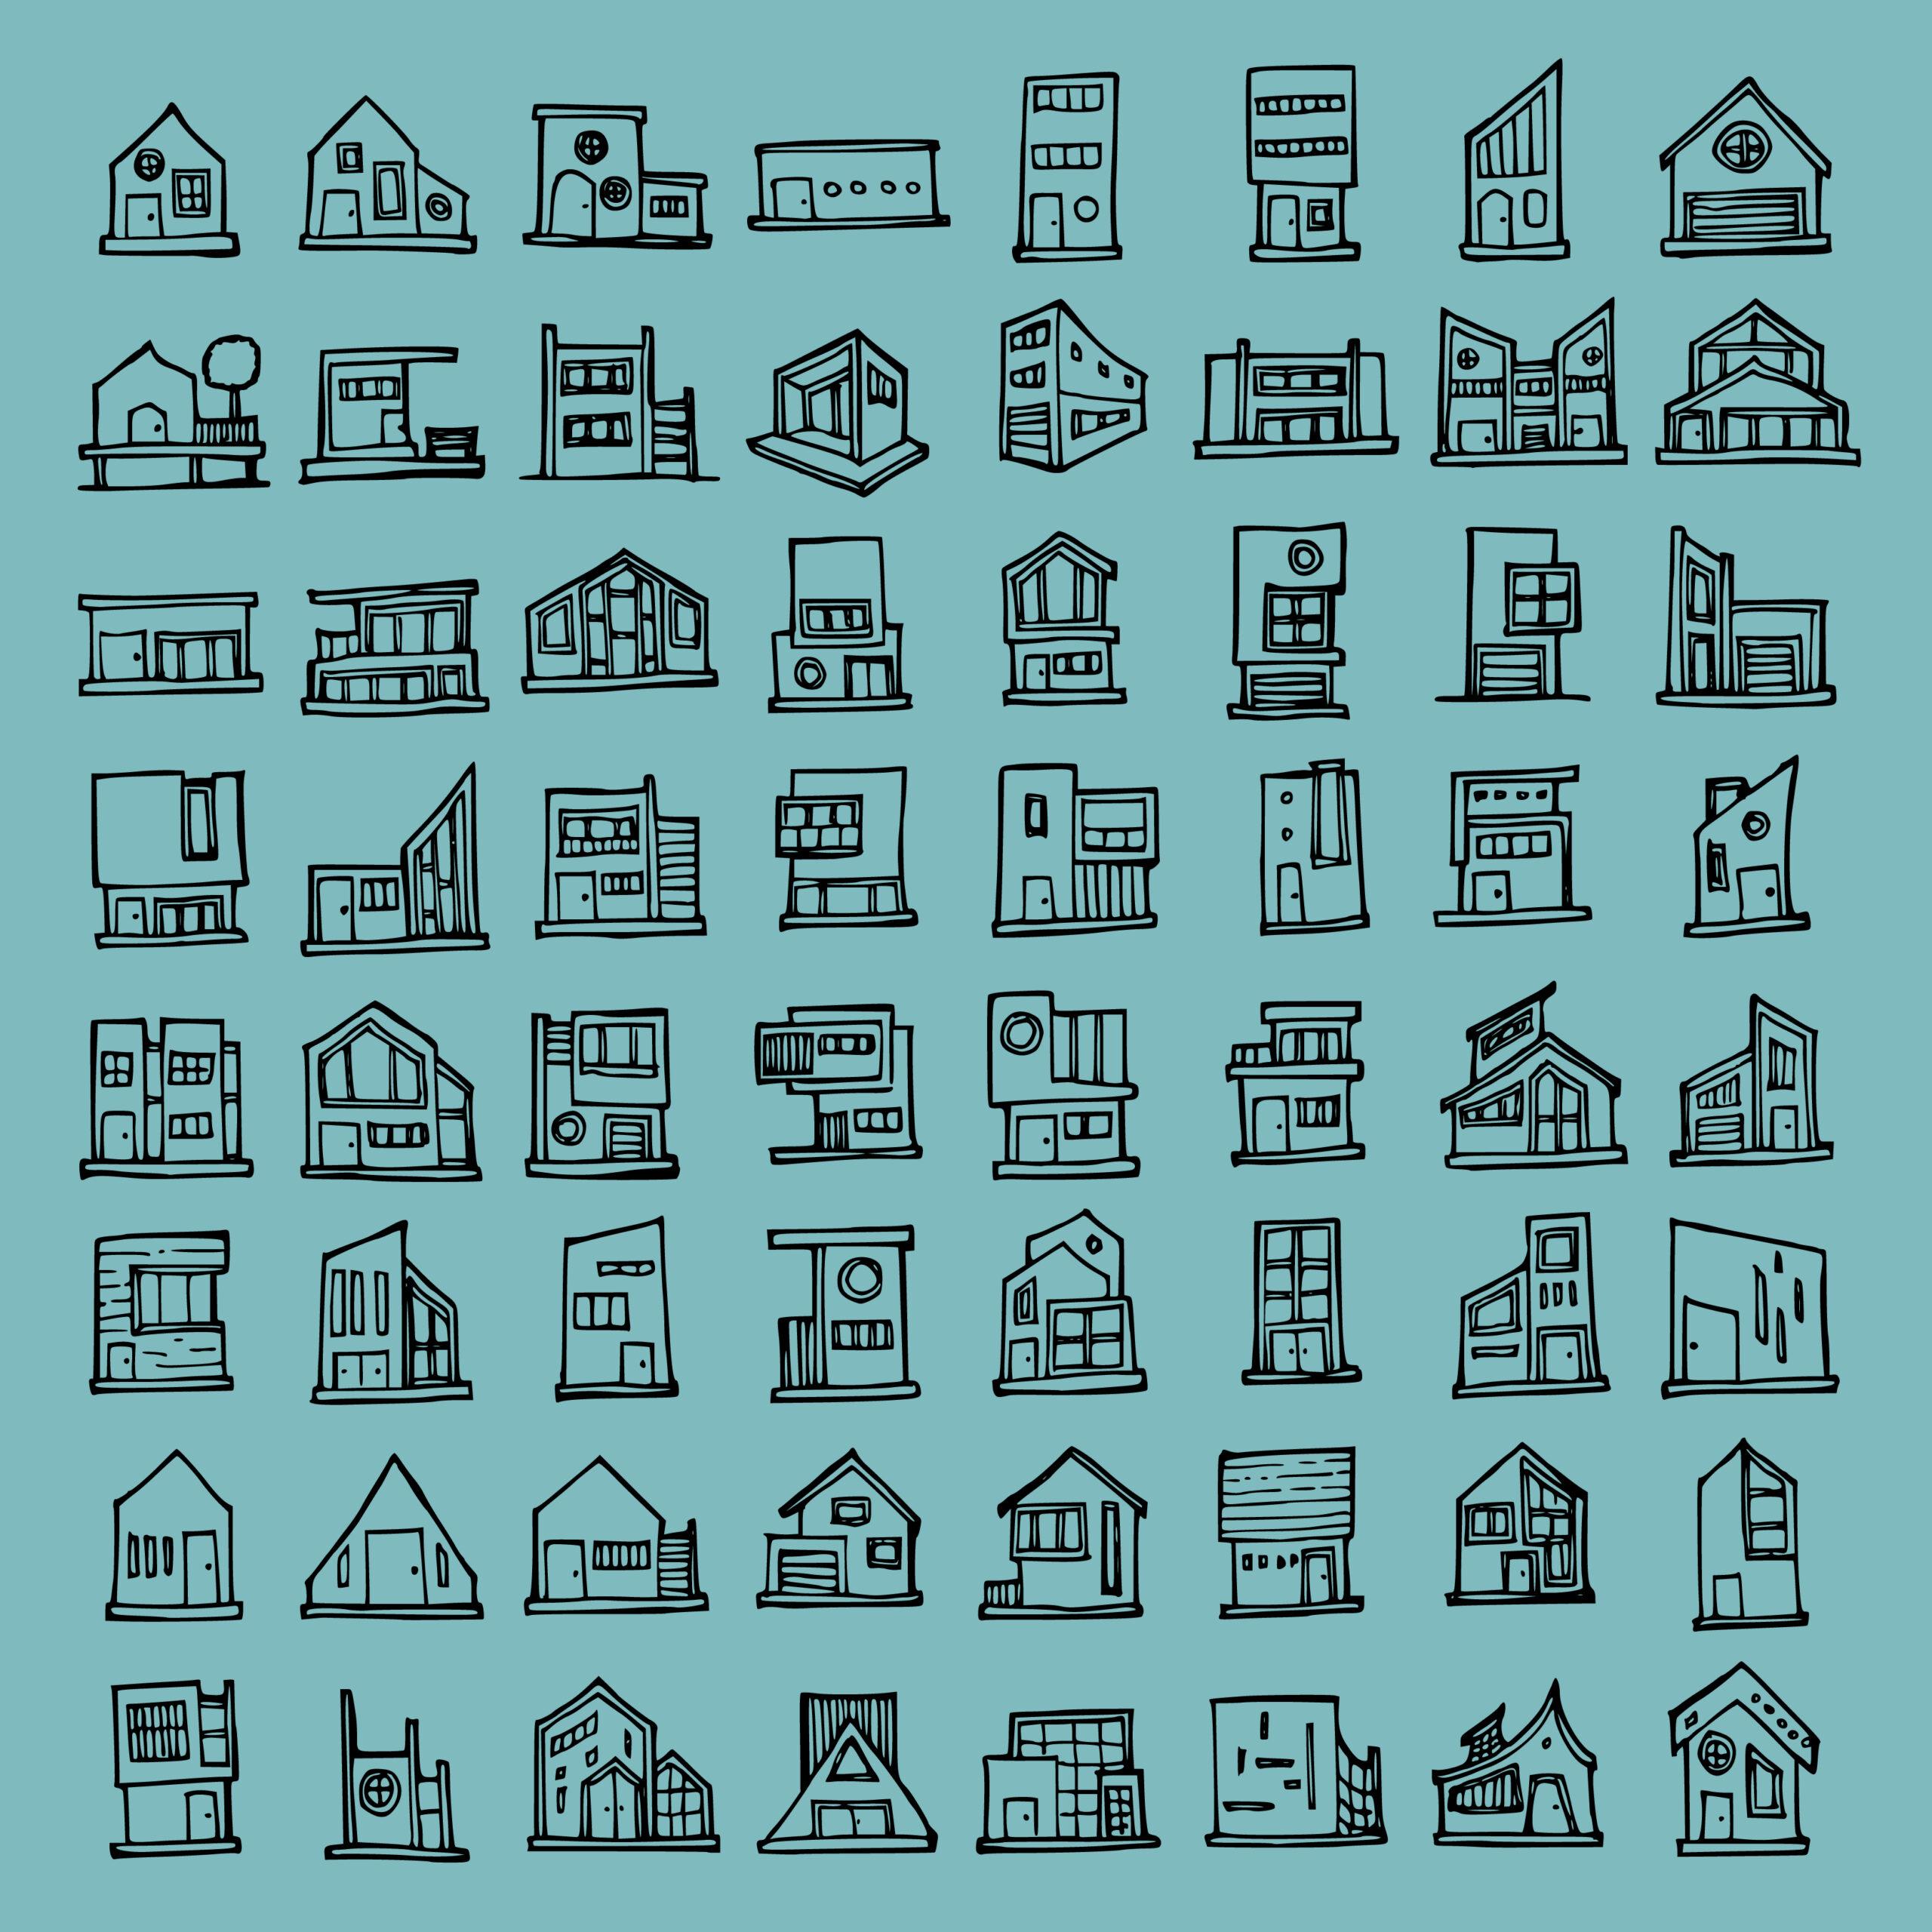 diseño de tu hogar